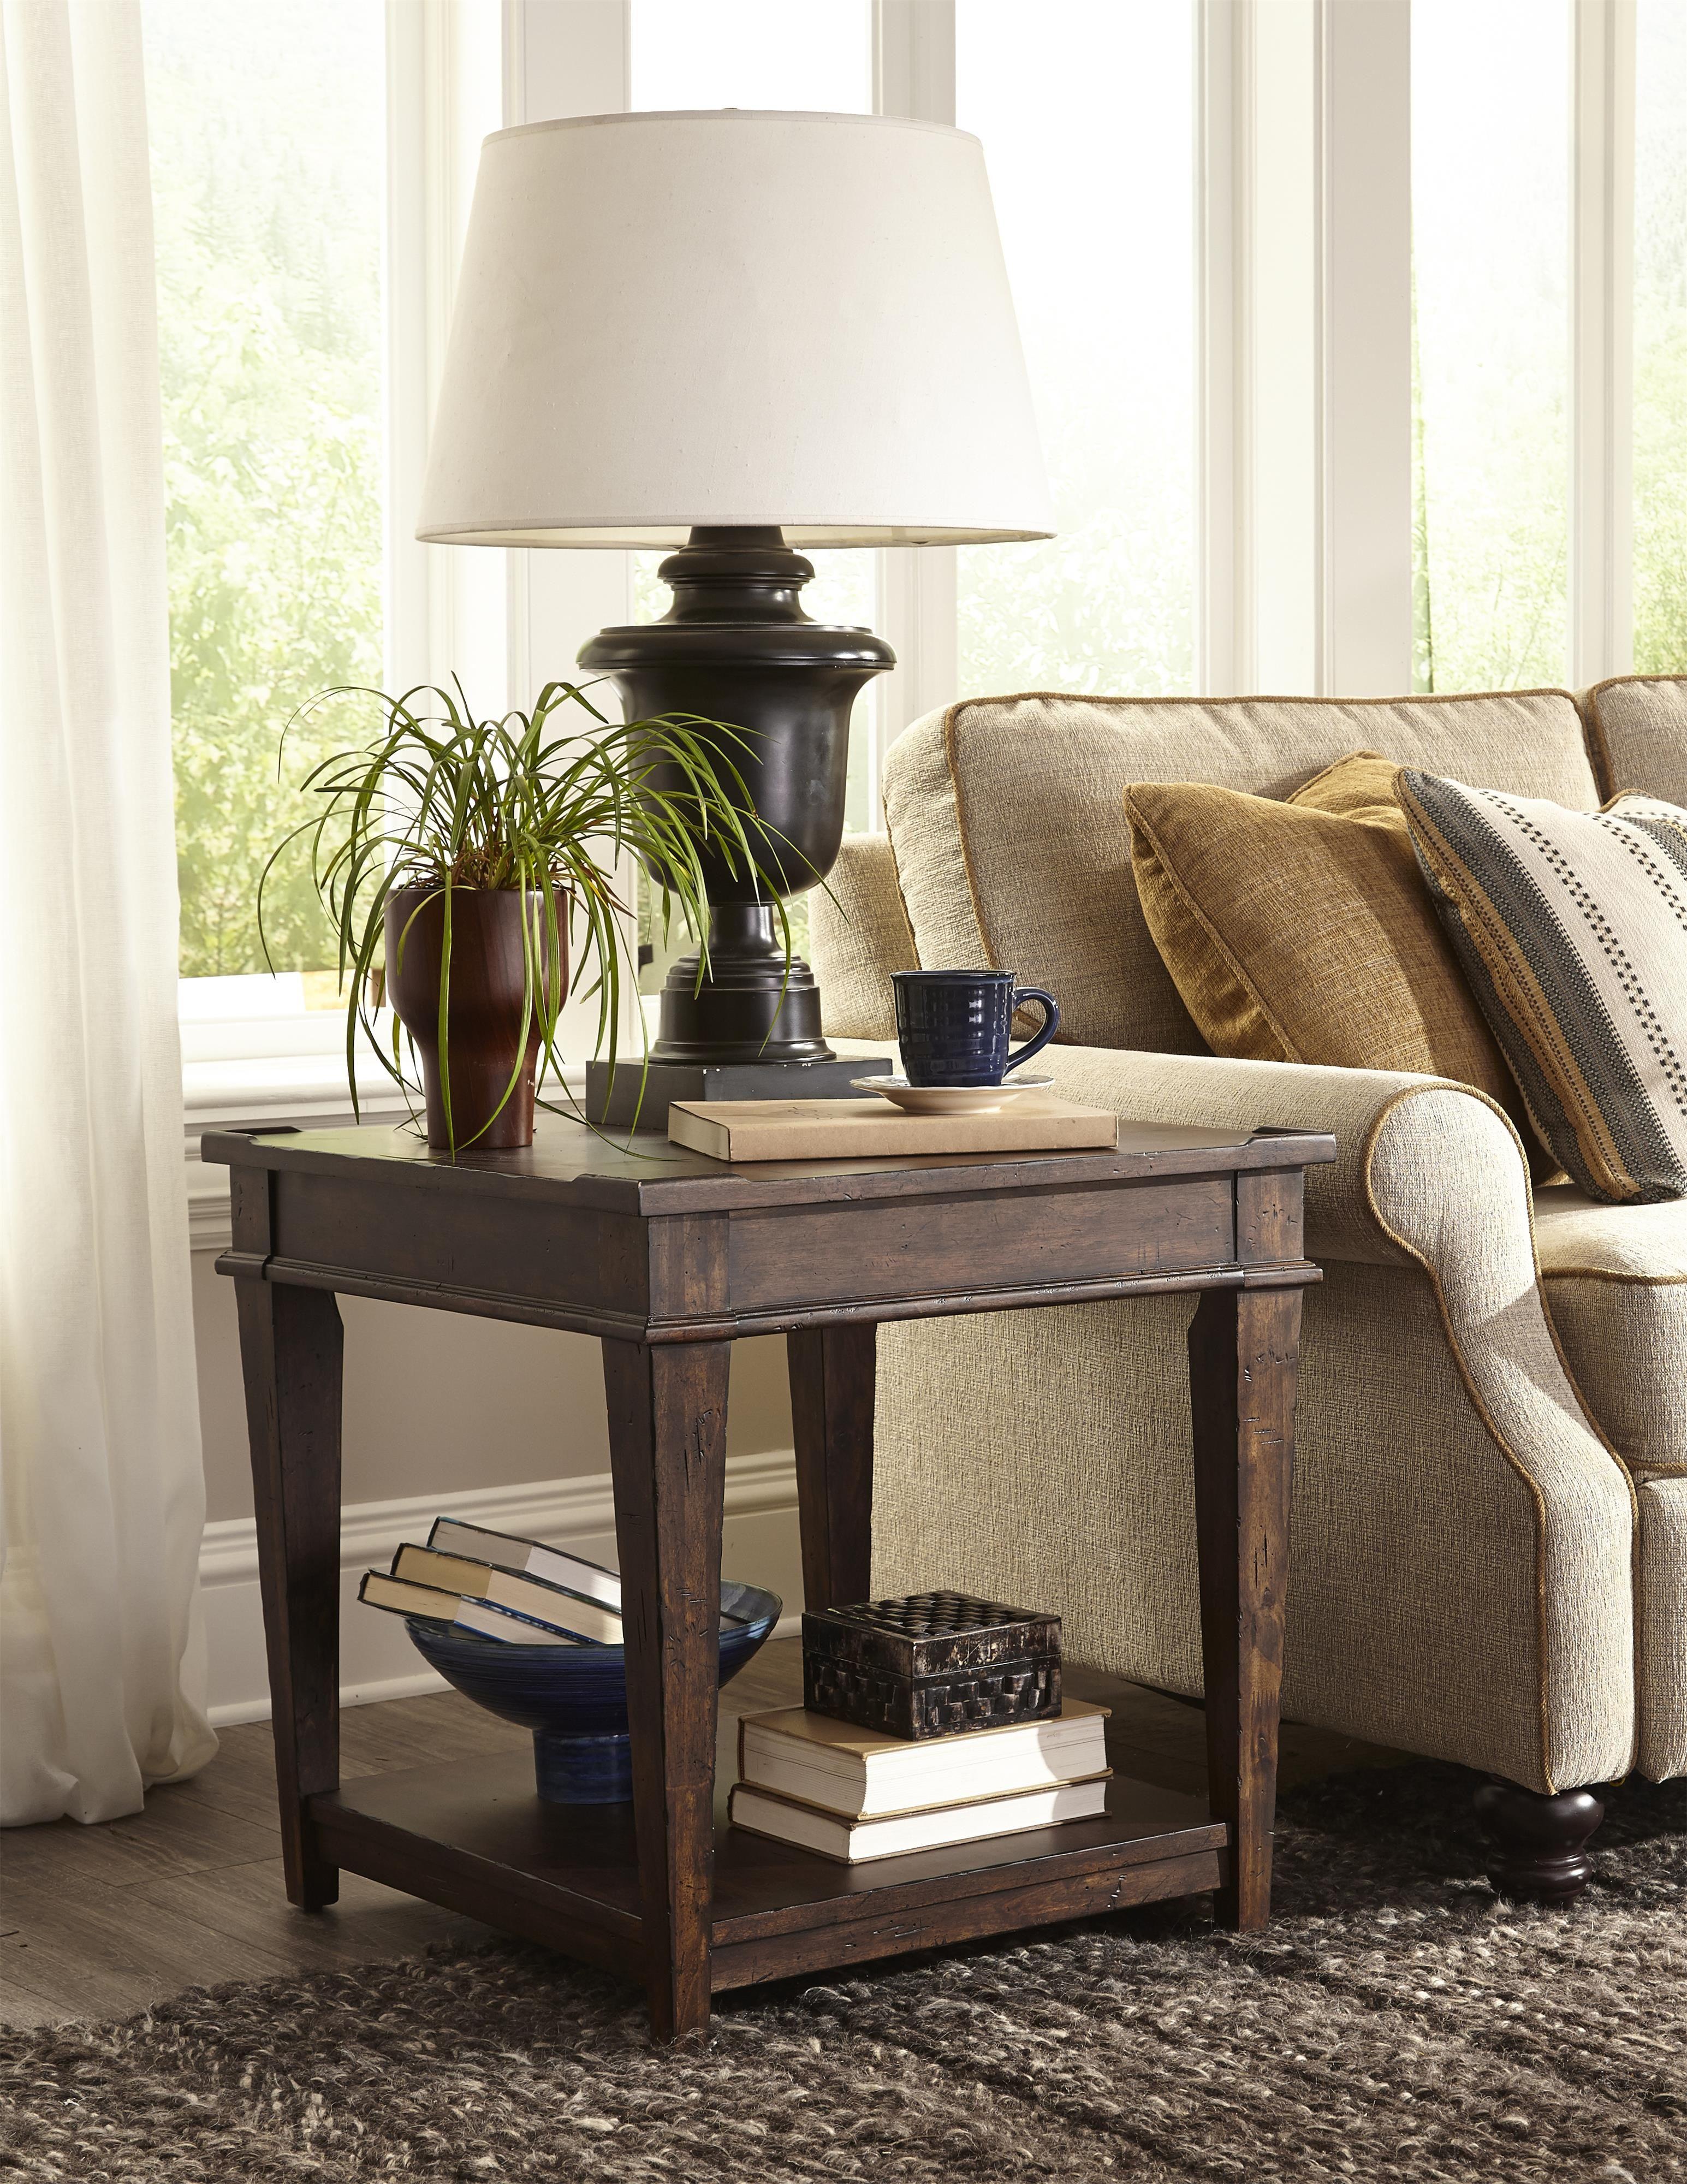 Trisha Yearwood Home End Table with One Shelf by Trisha